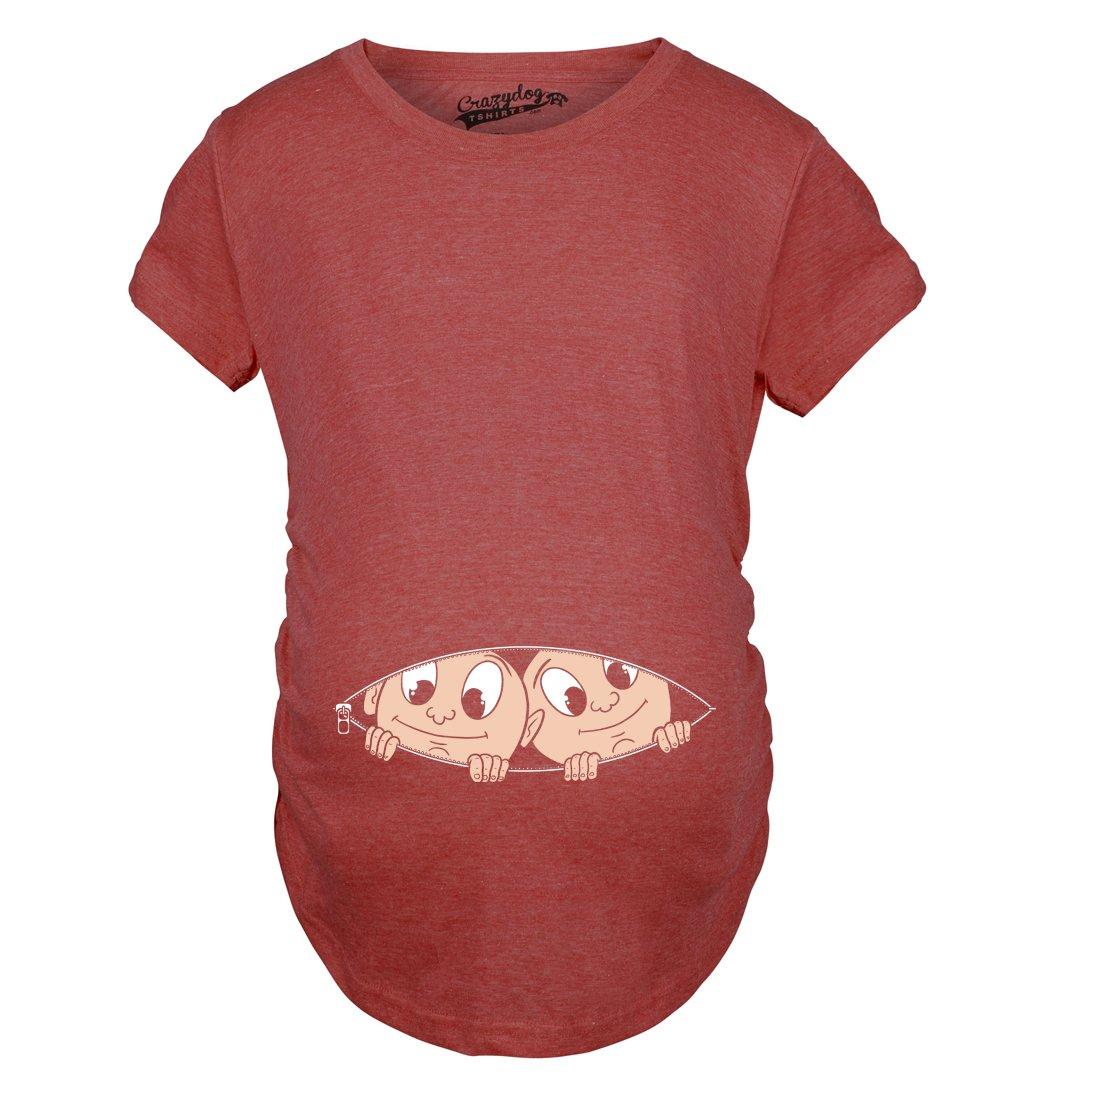 748dac0a1d13d Connoworld 1Pcs Maternity Adjustable Elastic Pants Waist Extender Pregnancy  Waistband Belt Pregnant Extensor Pants Belt A3645214UI